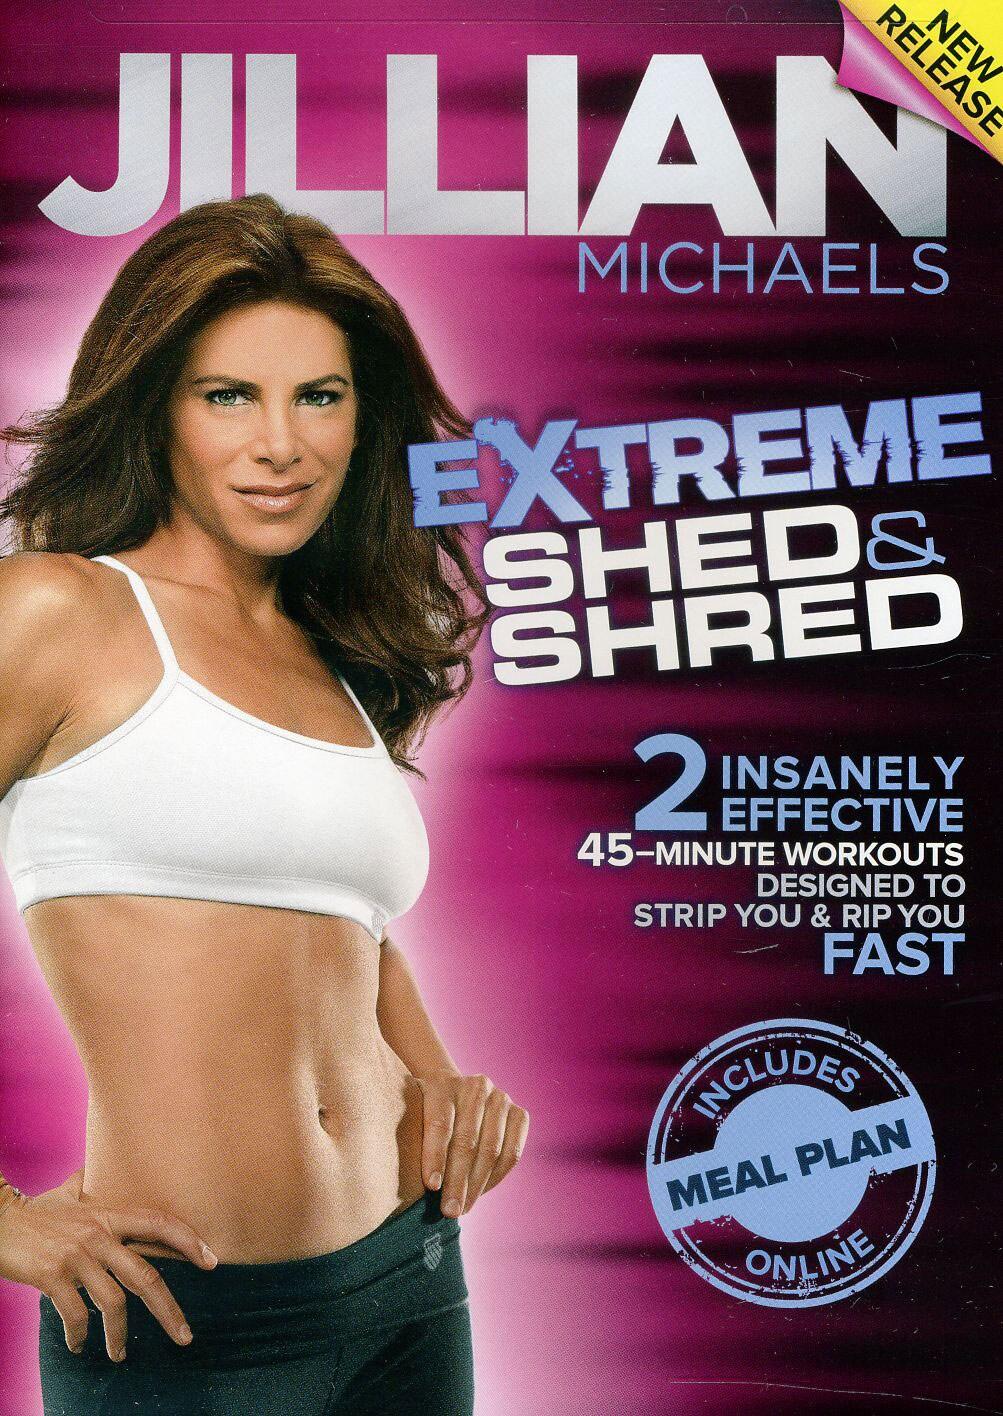 Jillian Michaels: Extreme Shed & Shred (DVD)